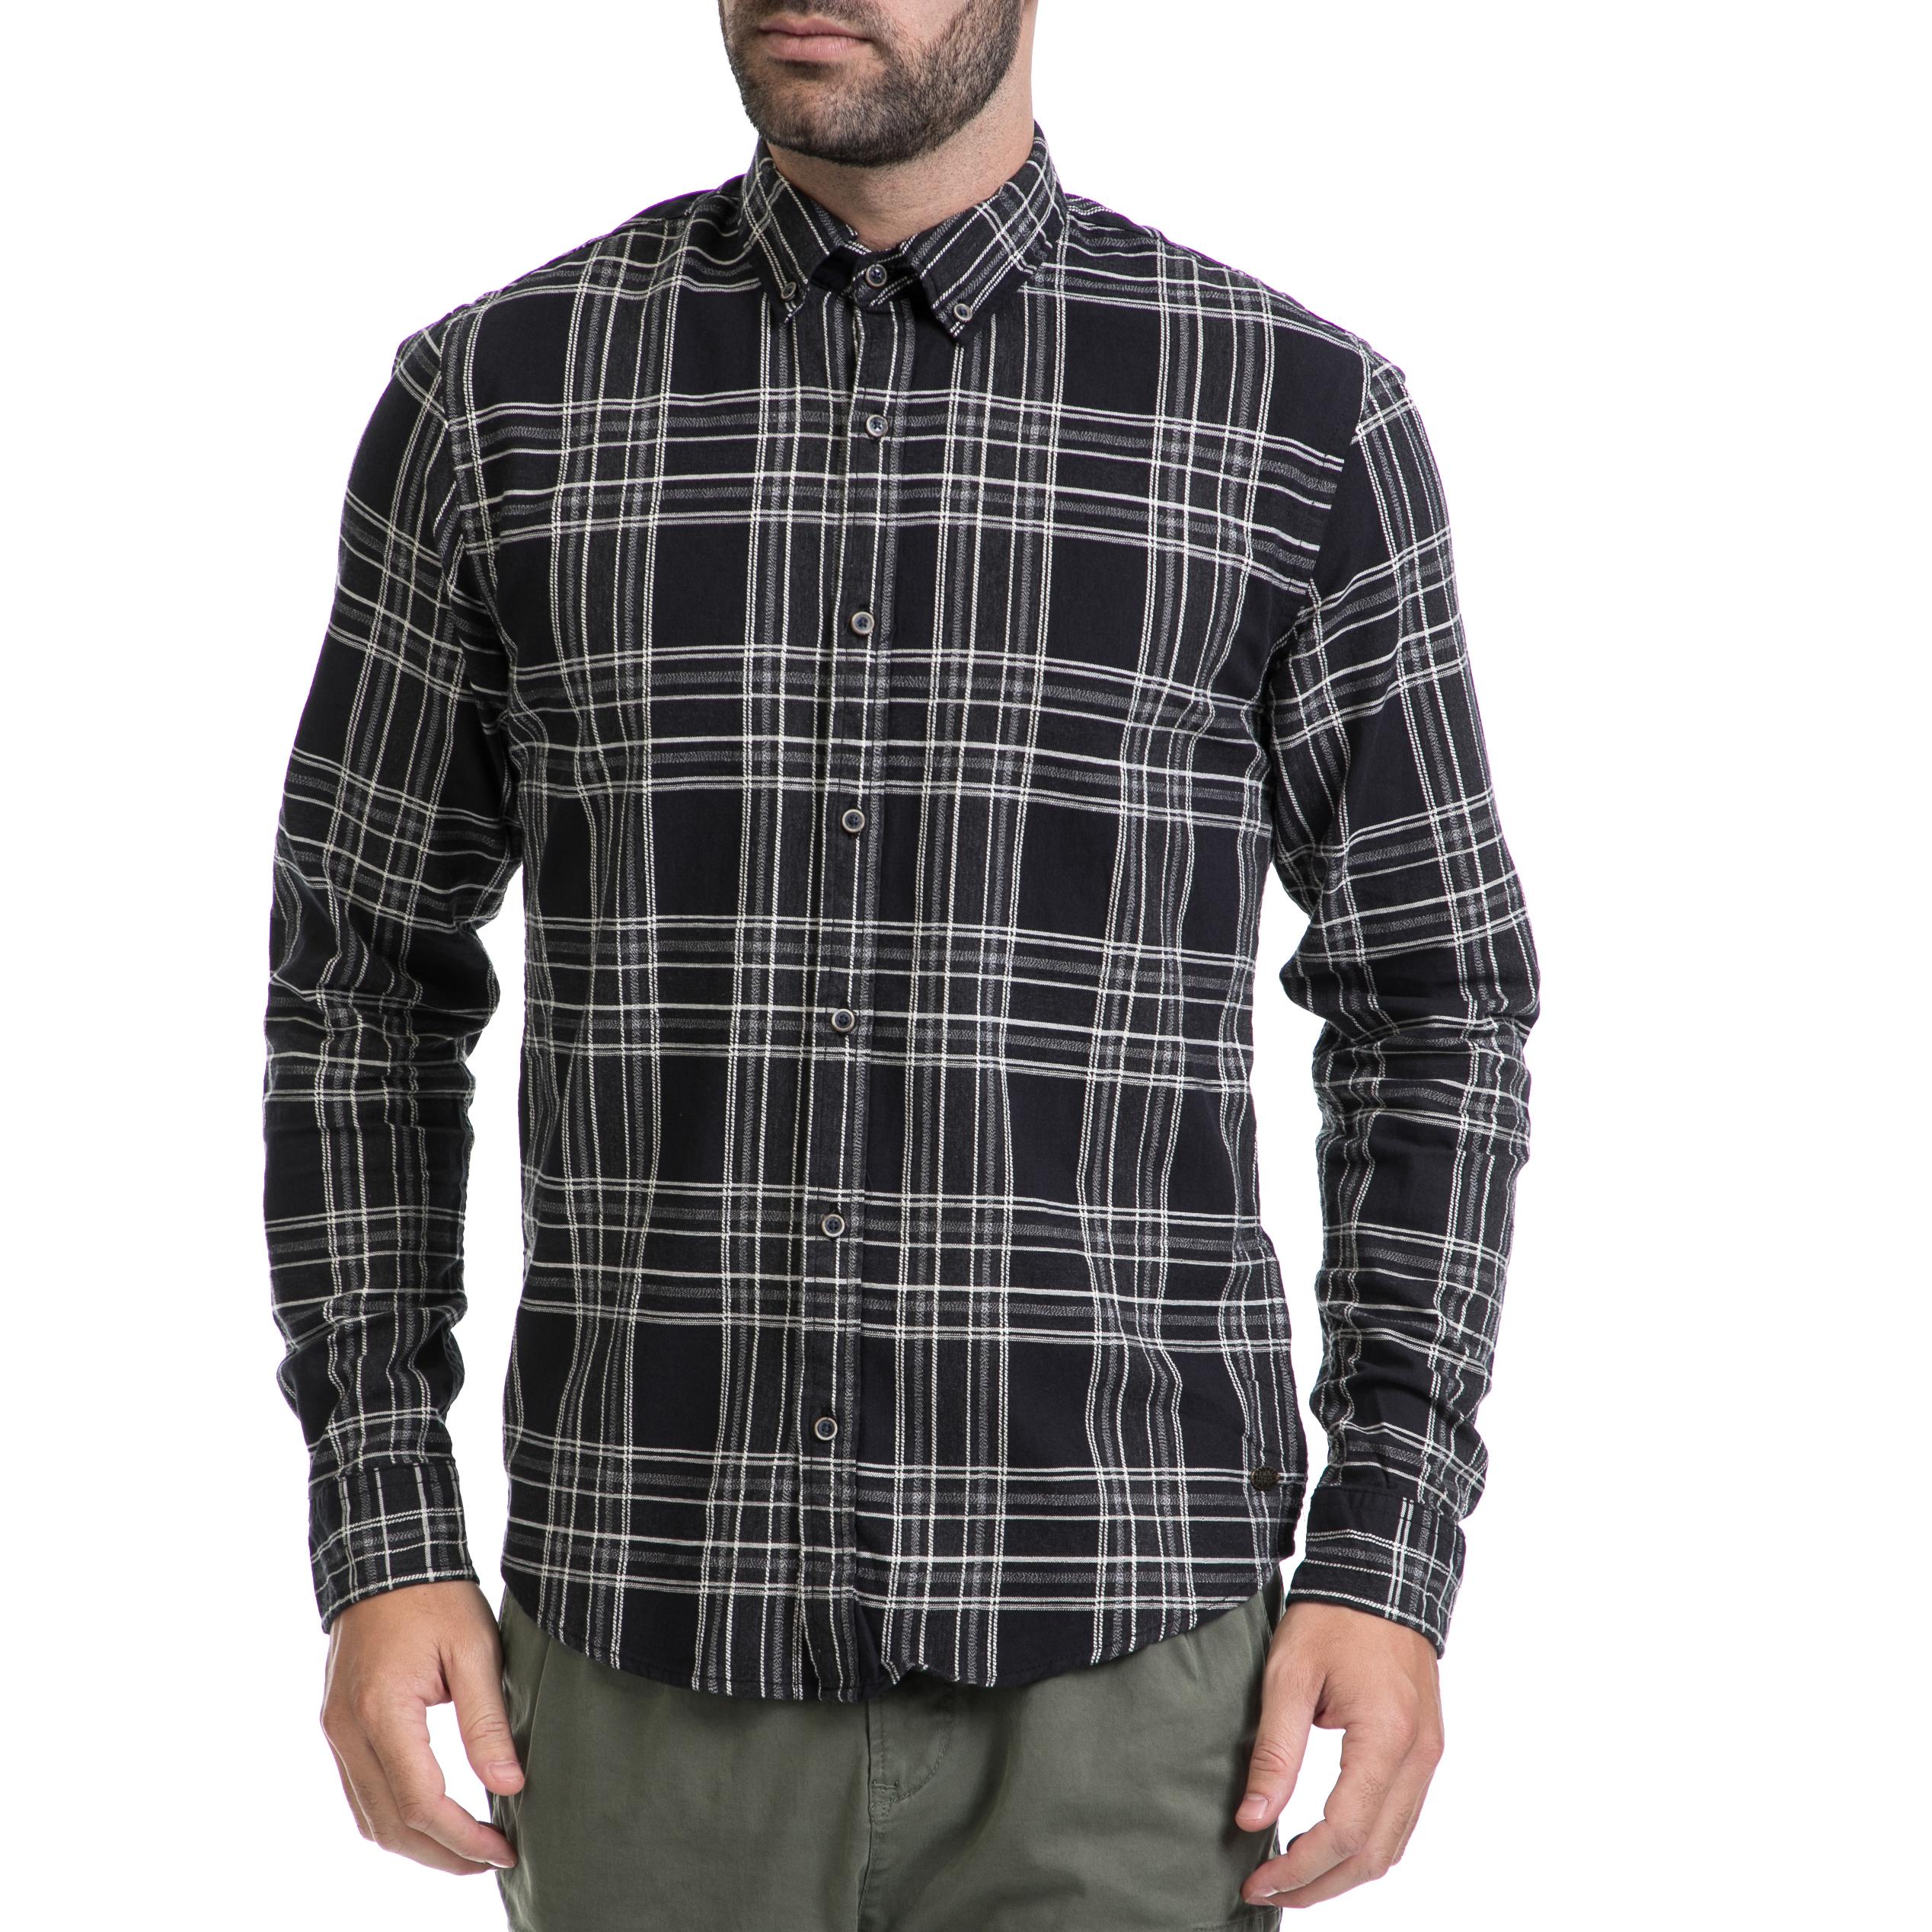 SCOTCH & SODA - Ανδρικό πουκάμισο SCOTCH & SODA μαύρο ανδρικά ρούχα πουκάμισα μακρυμάνικα